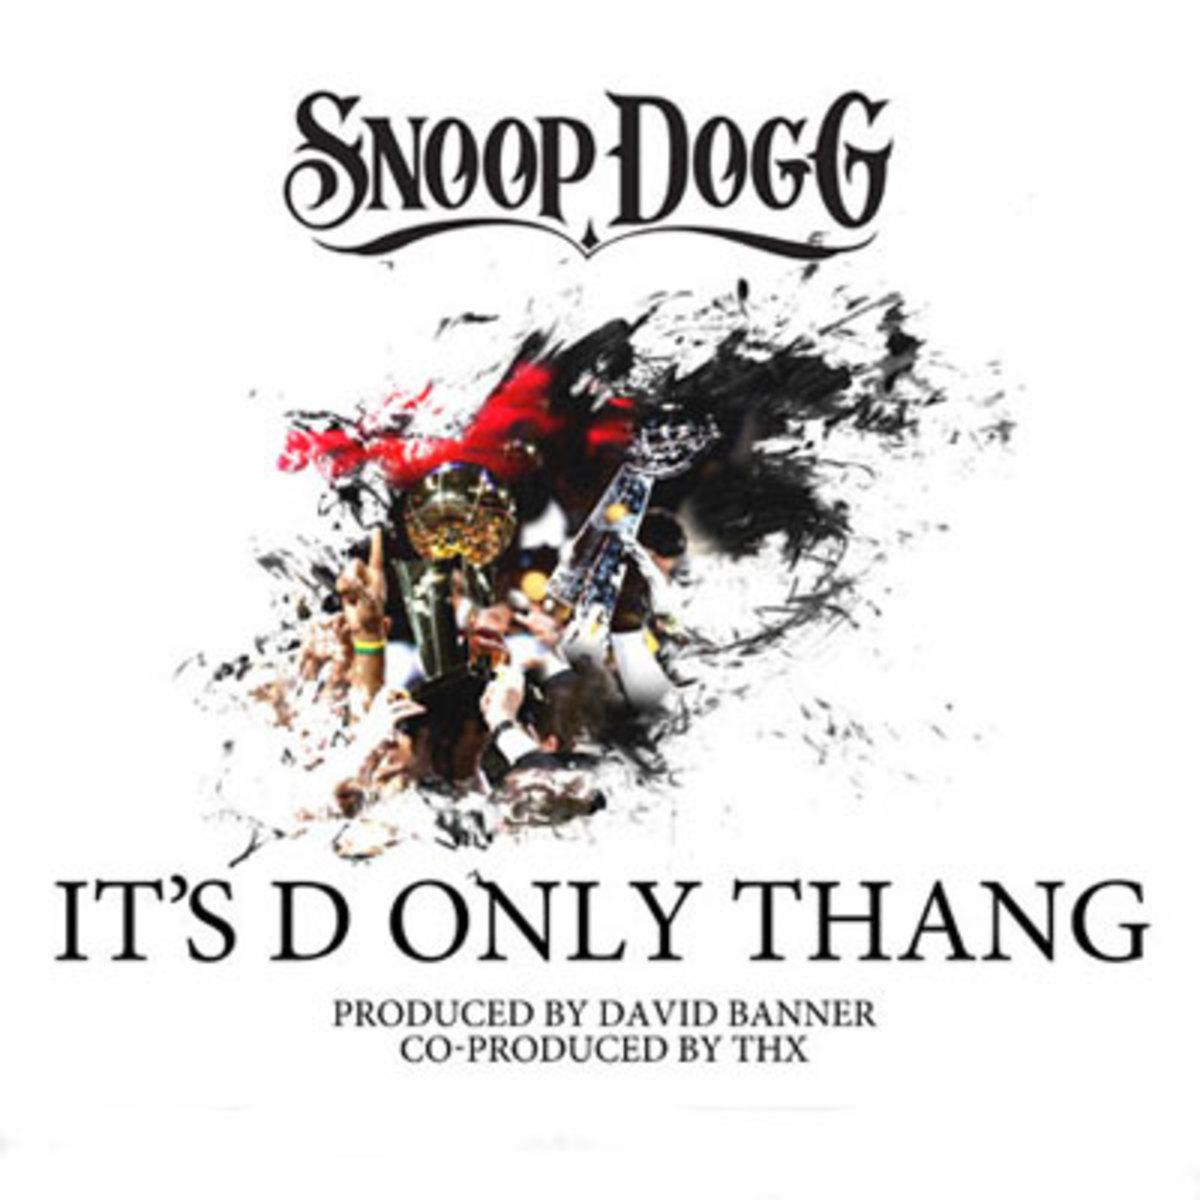 snoopdogg-itsdonlything.jpg